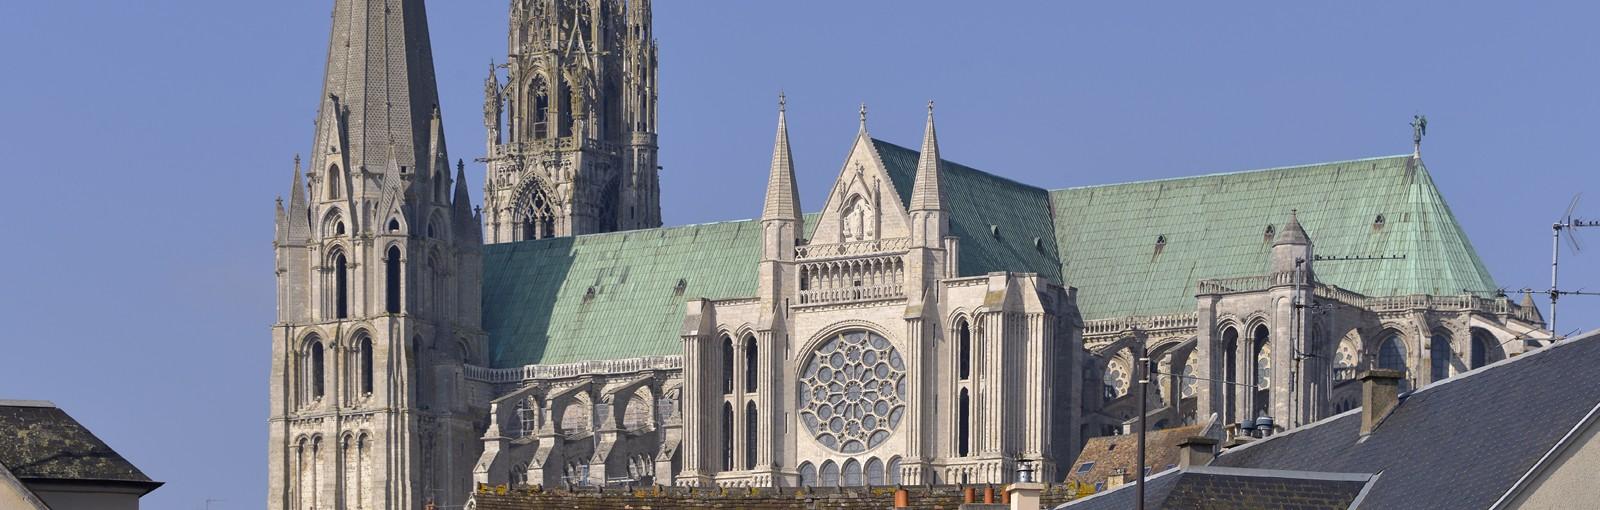 Tours 沙特尔Chartres - 半日游 - 从巴黎出发的一日游